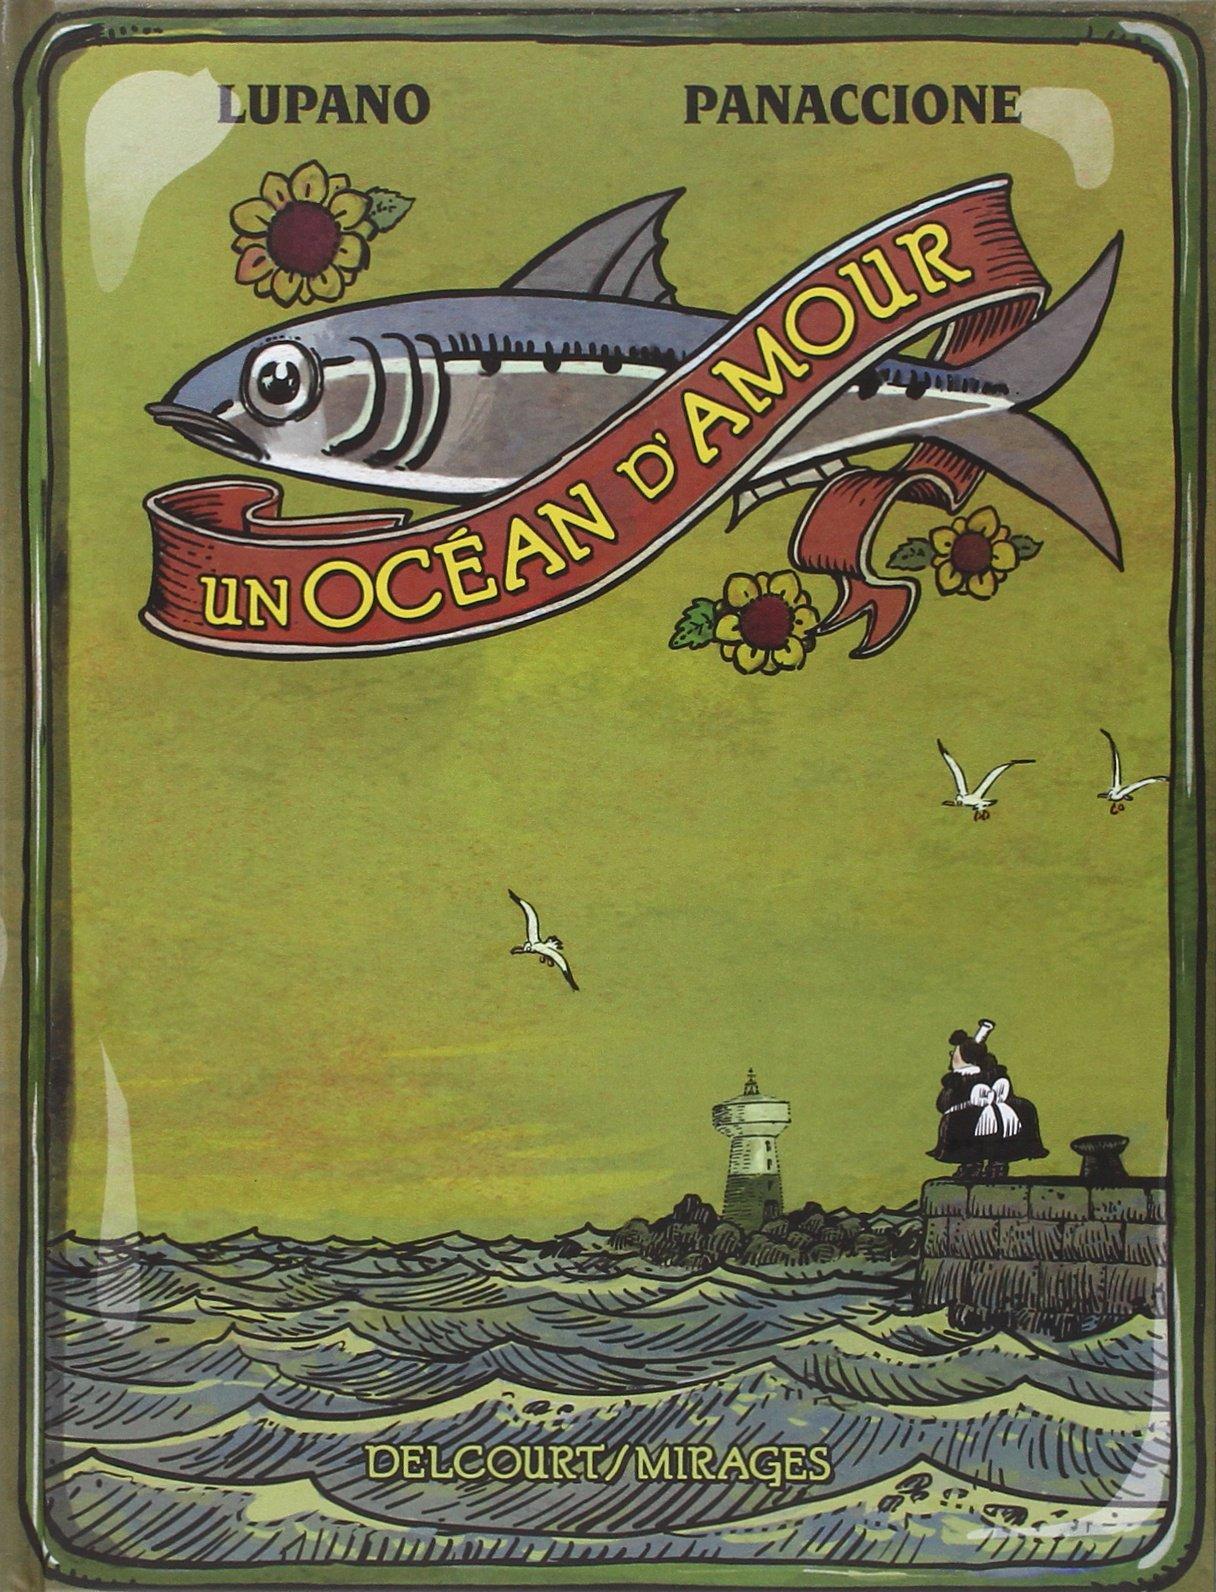 Un océan d'amour de Wilfrid Lupano & Gregory Panaccione  81NSvVJzNkL